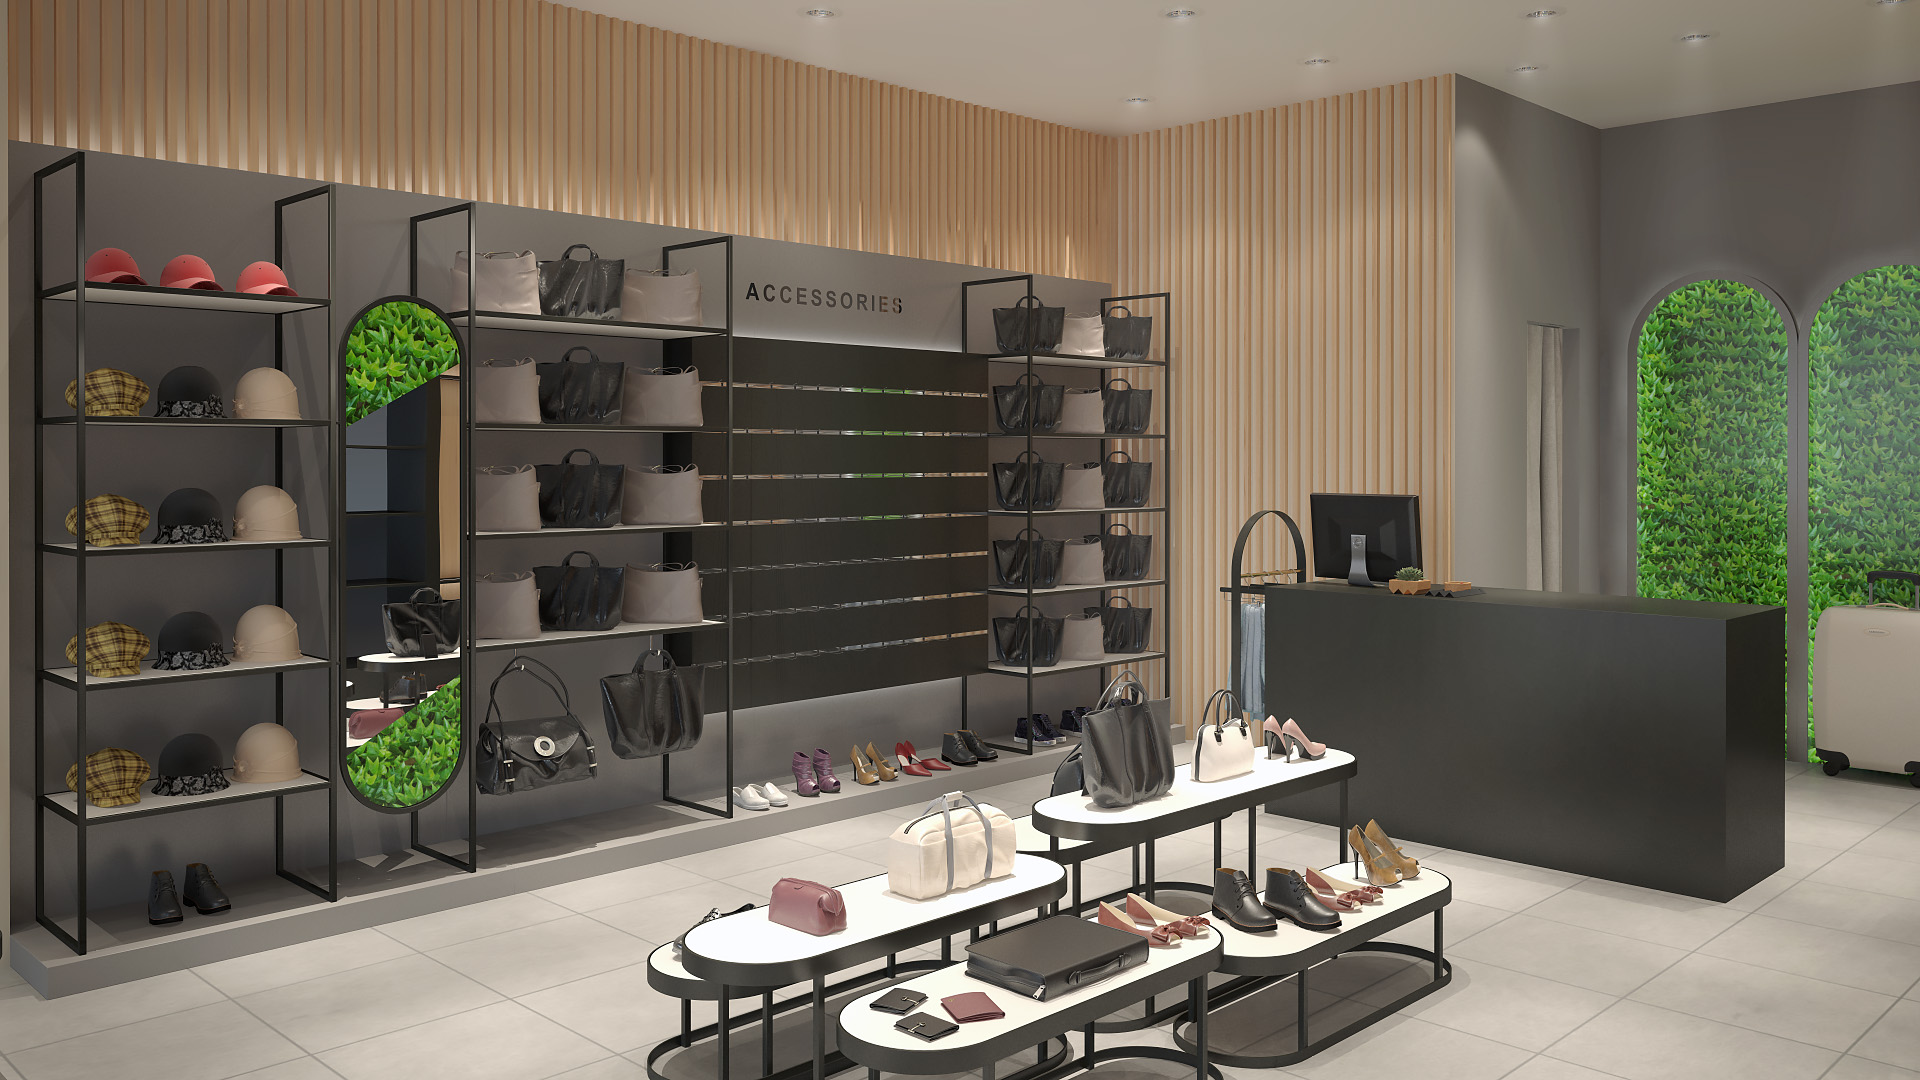 Duki Daso BIG Fashion SC store